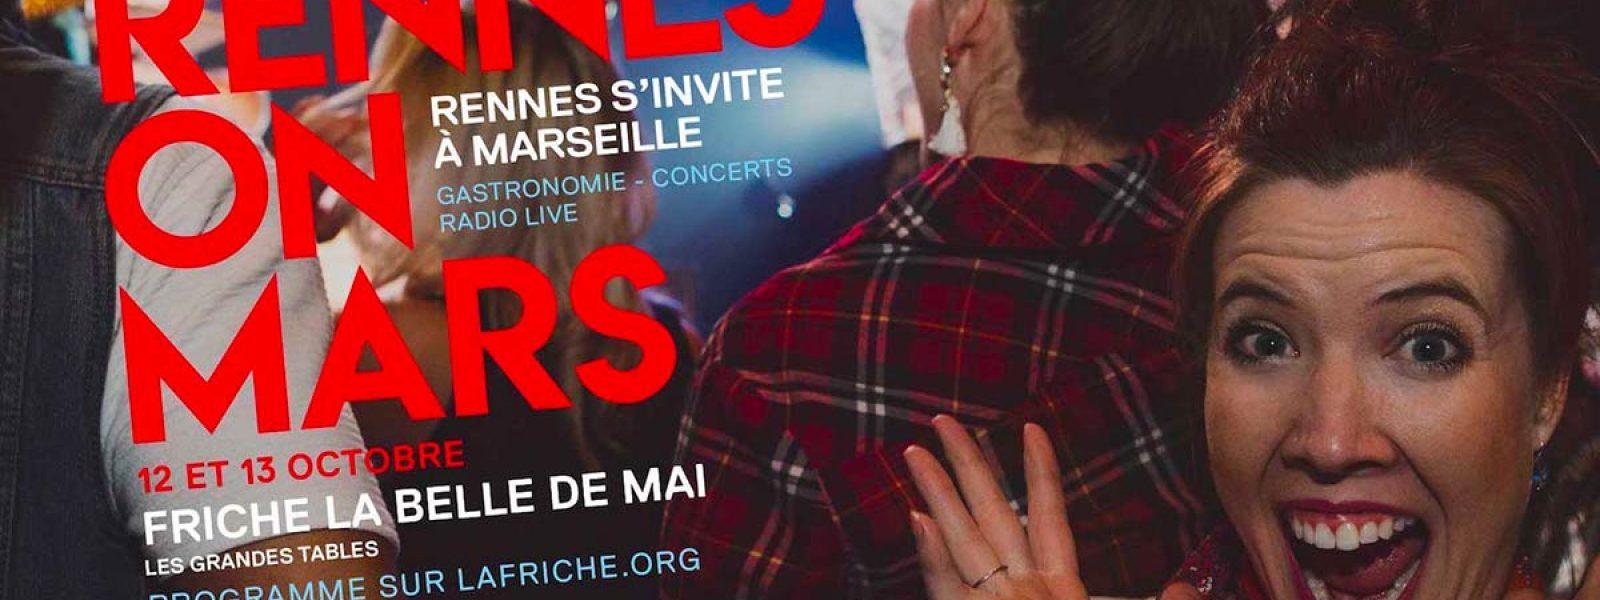 Rennes on Mars : Rennes s'invite à Marseille